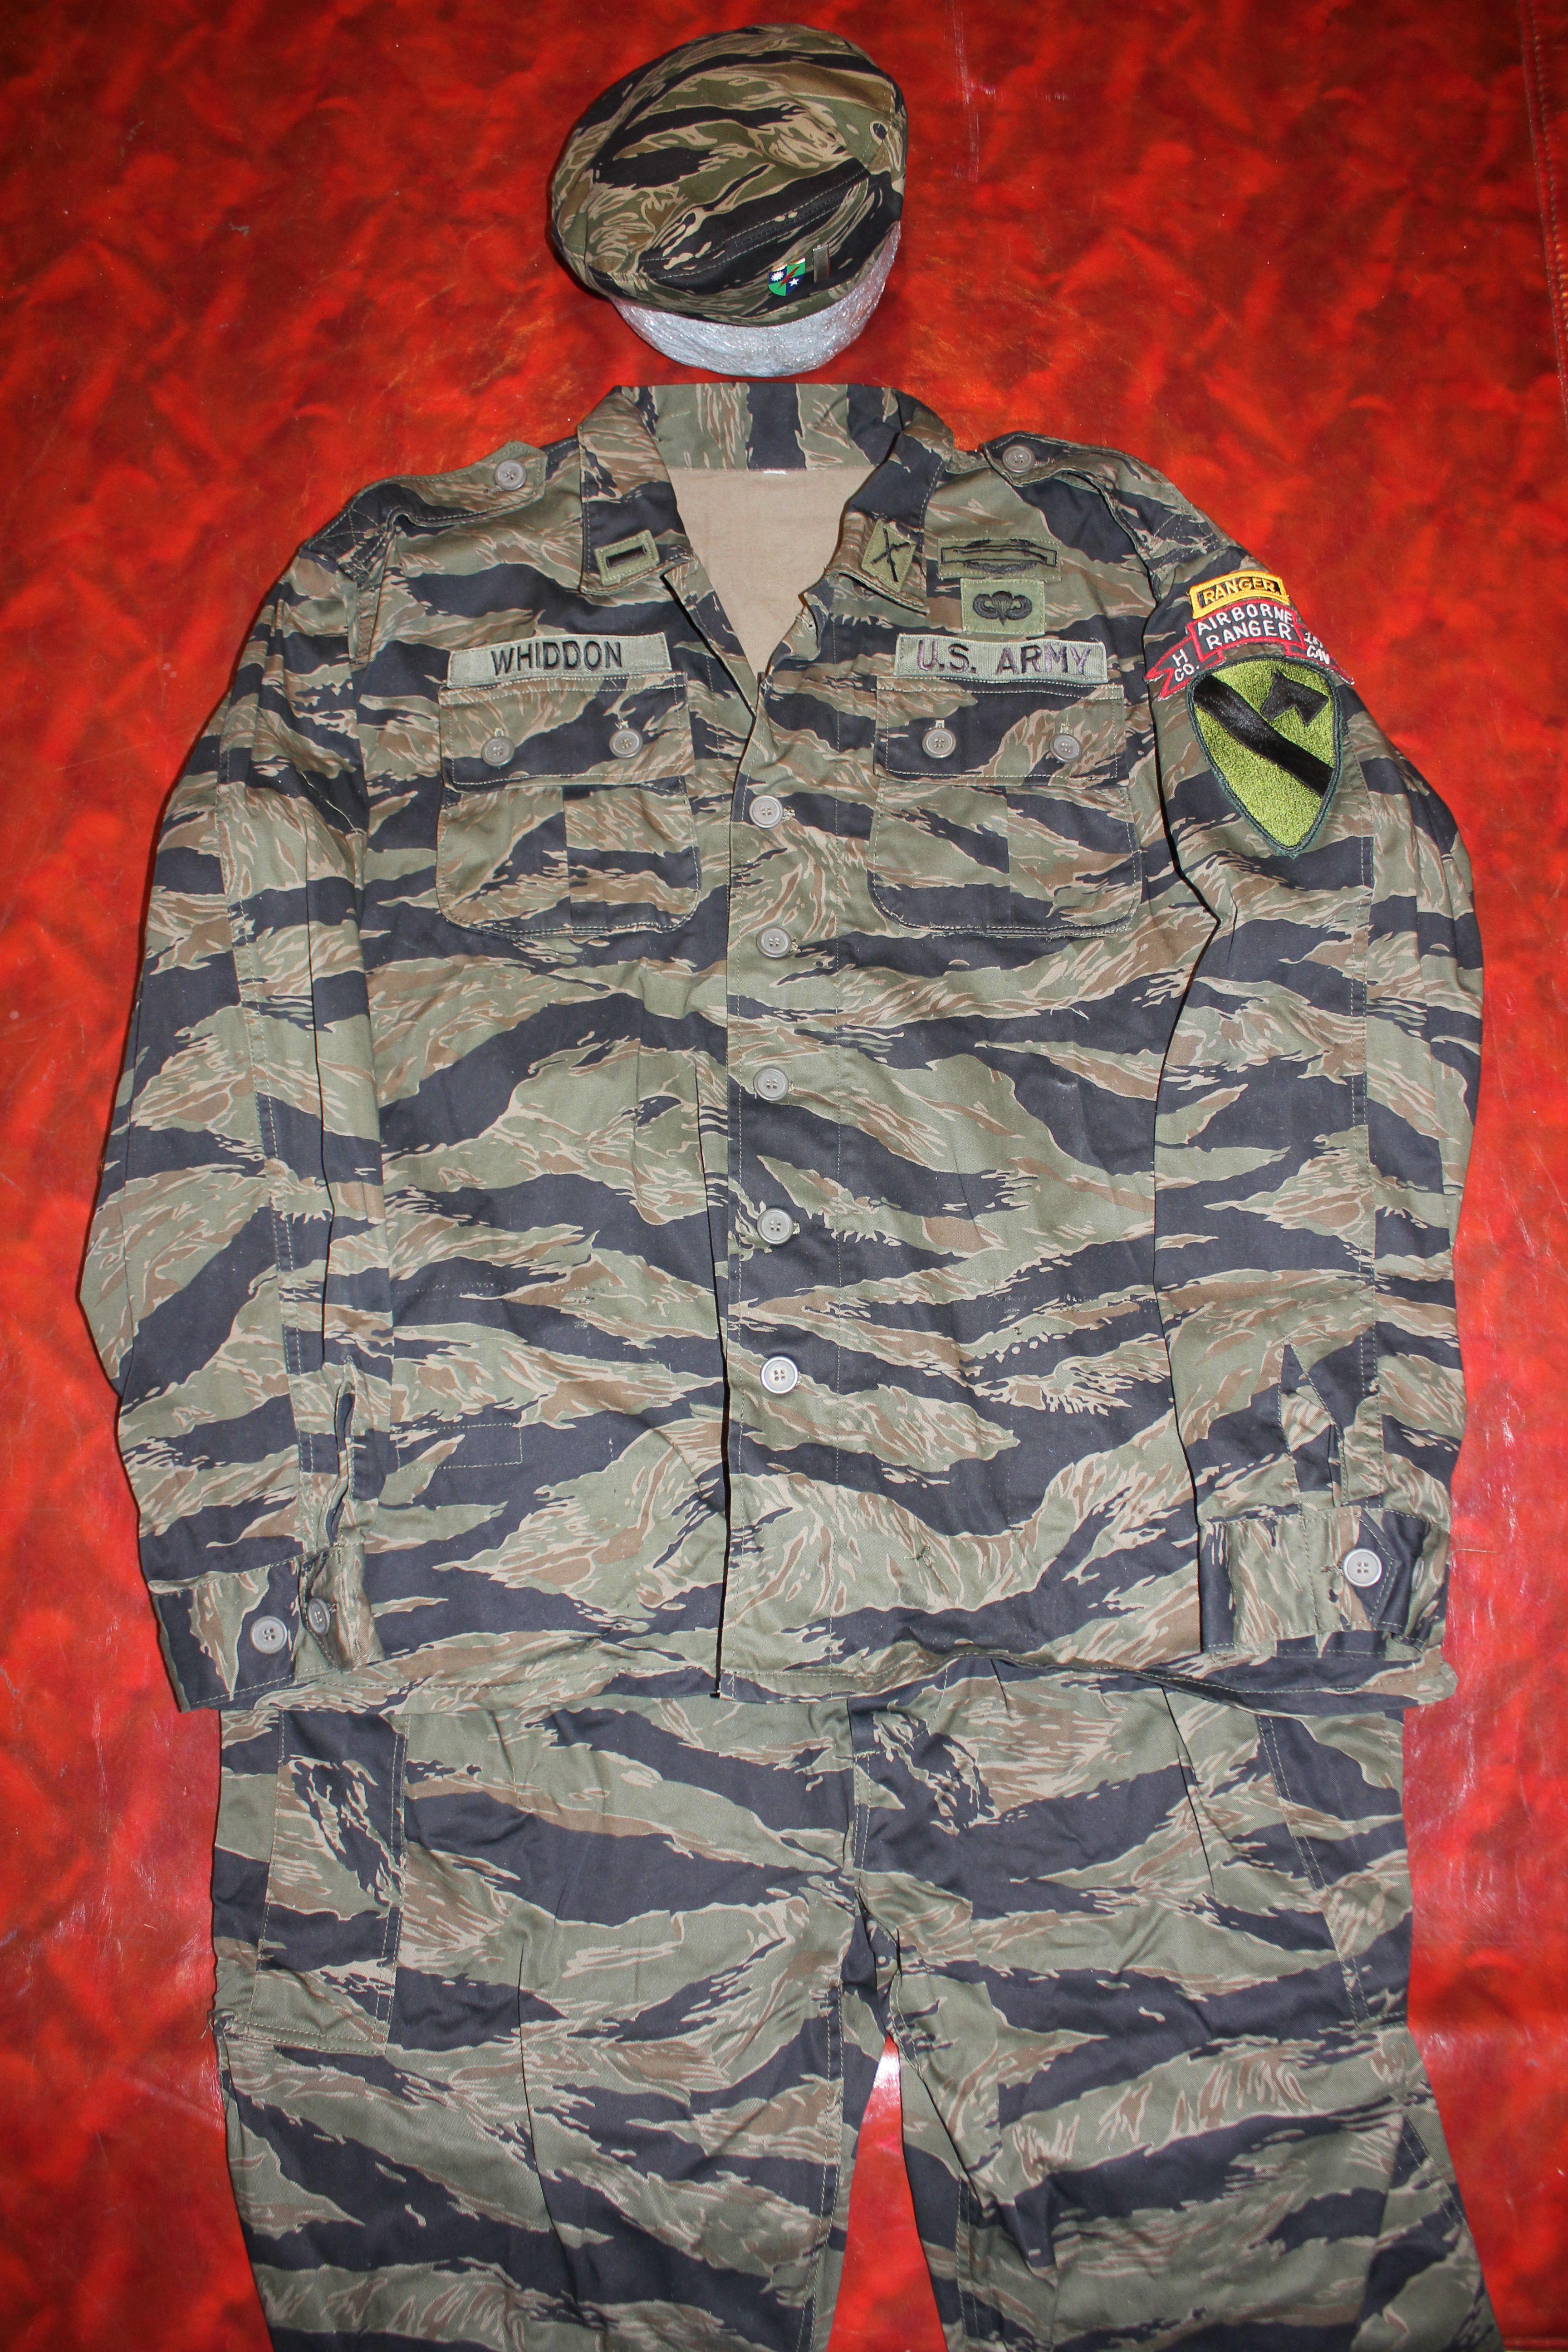 H Co. 75th (ABN) Ranger 1st Cav.Div. (With images ...